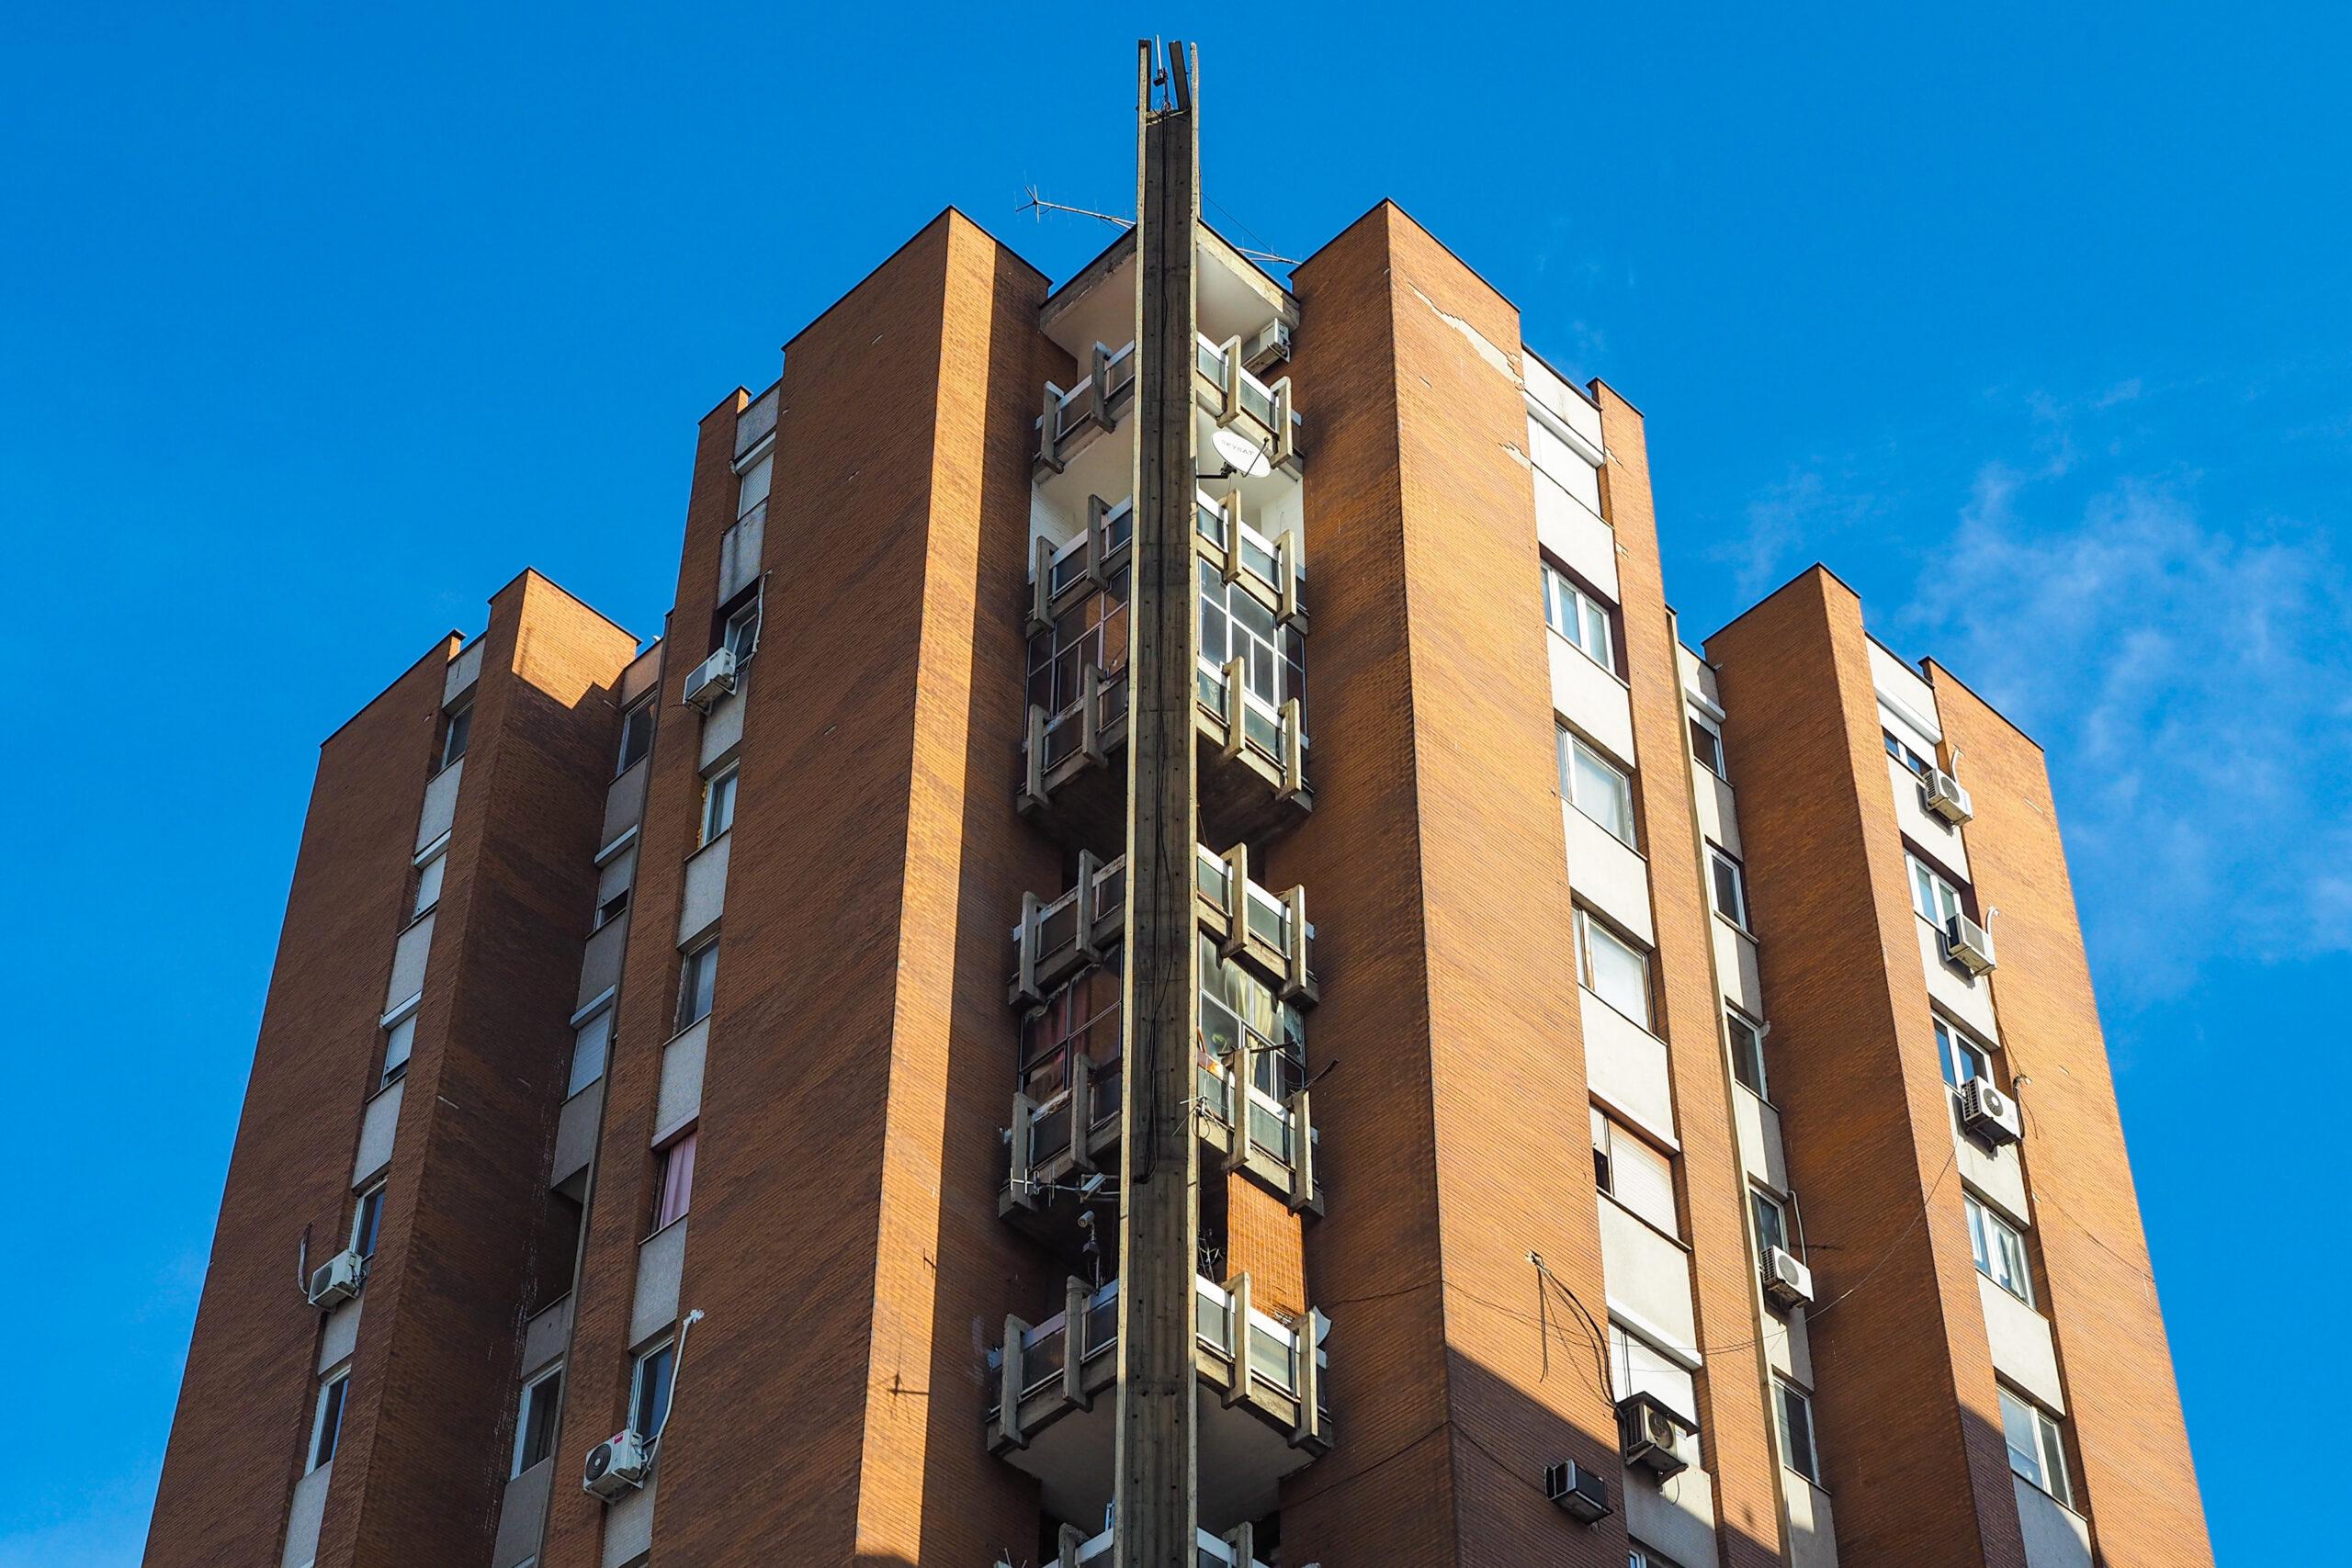 architettura brutalista